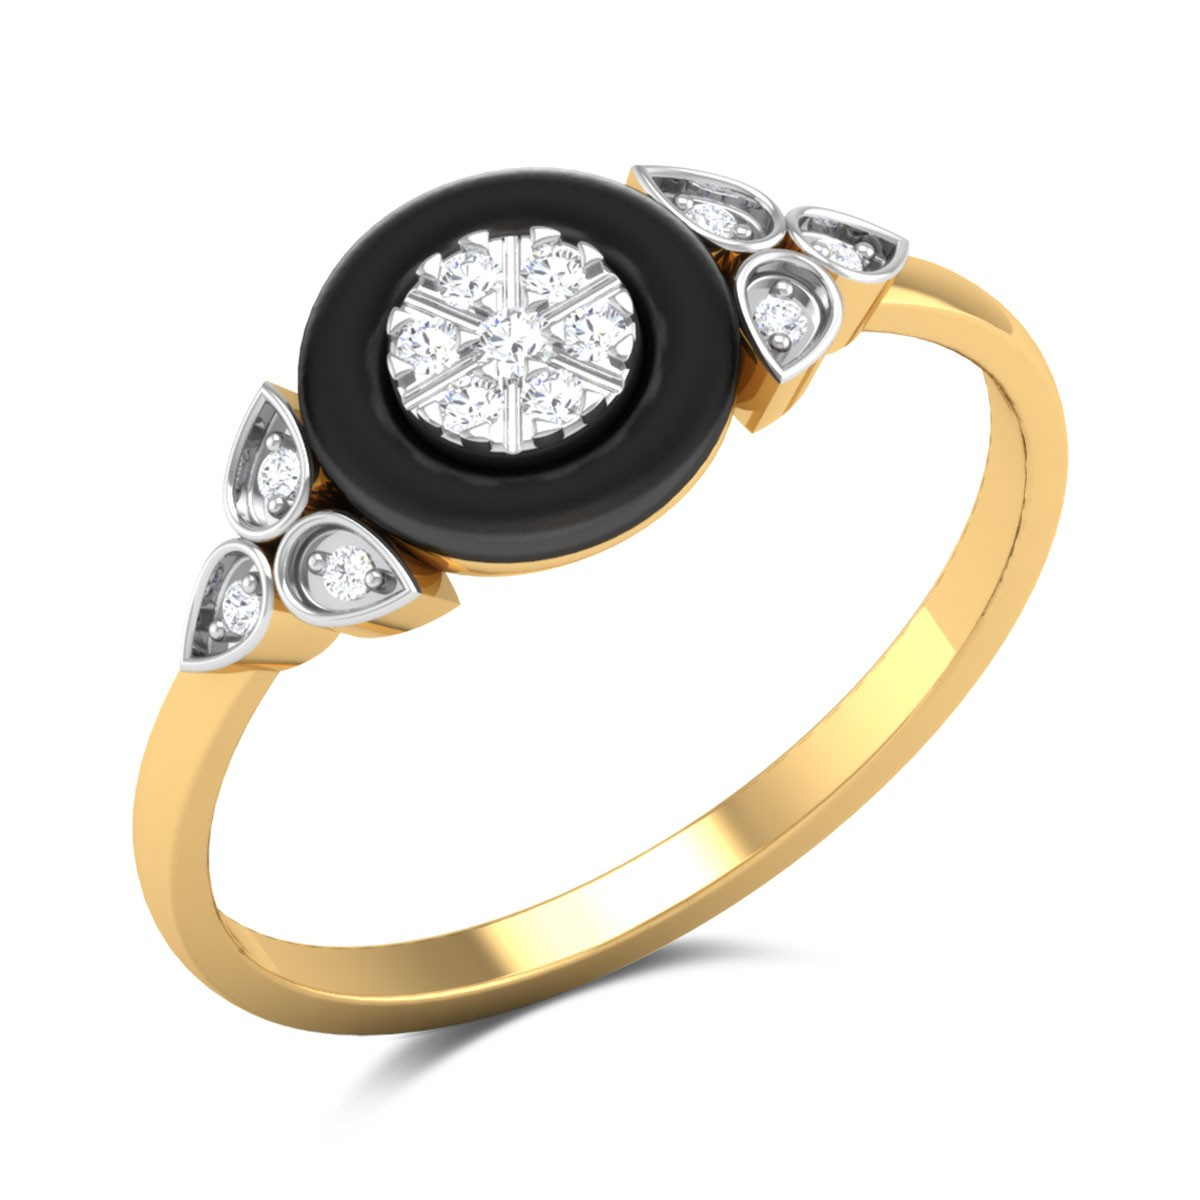 Inspira Diamond Ring